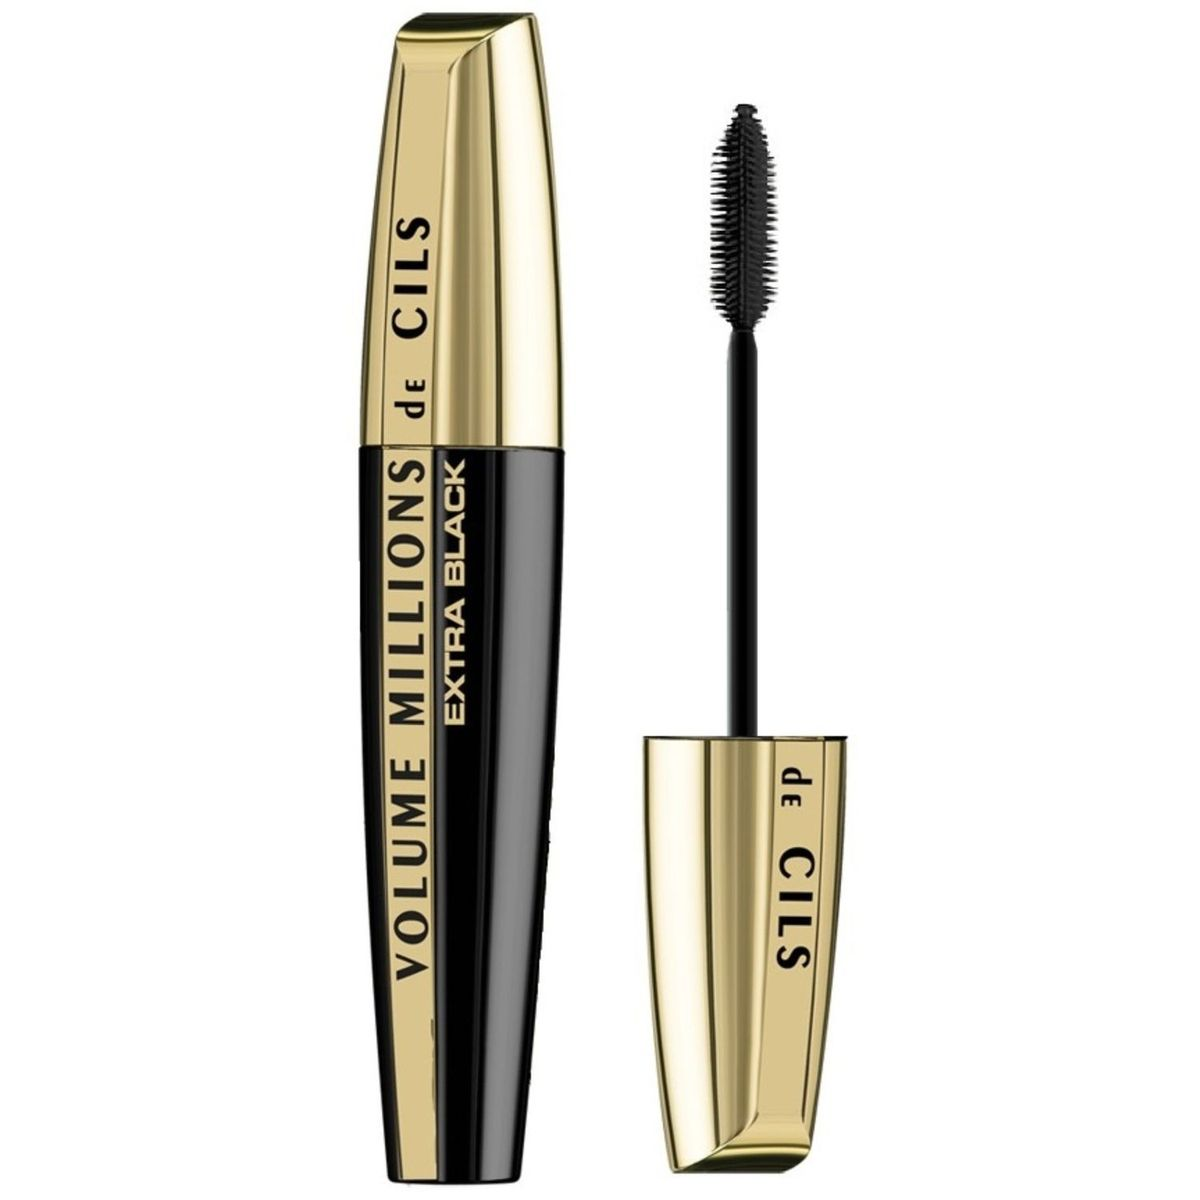 L'Oréal Volume millions de cils mascara volume extra black 9,2ml x1